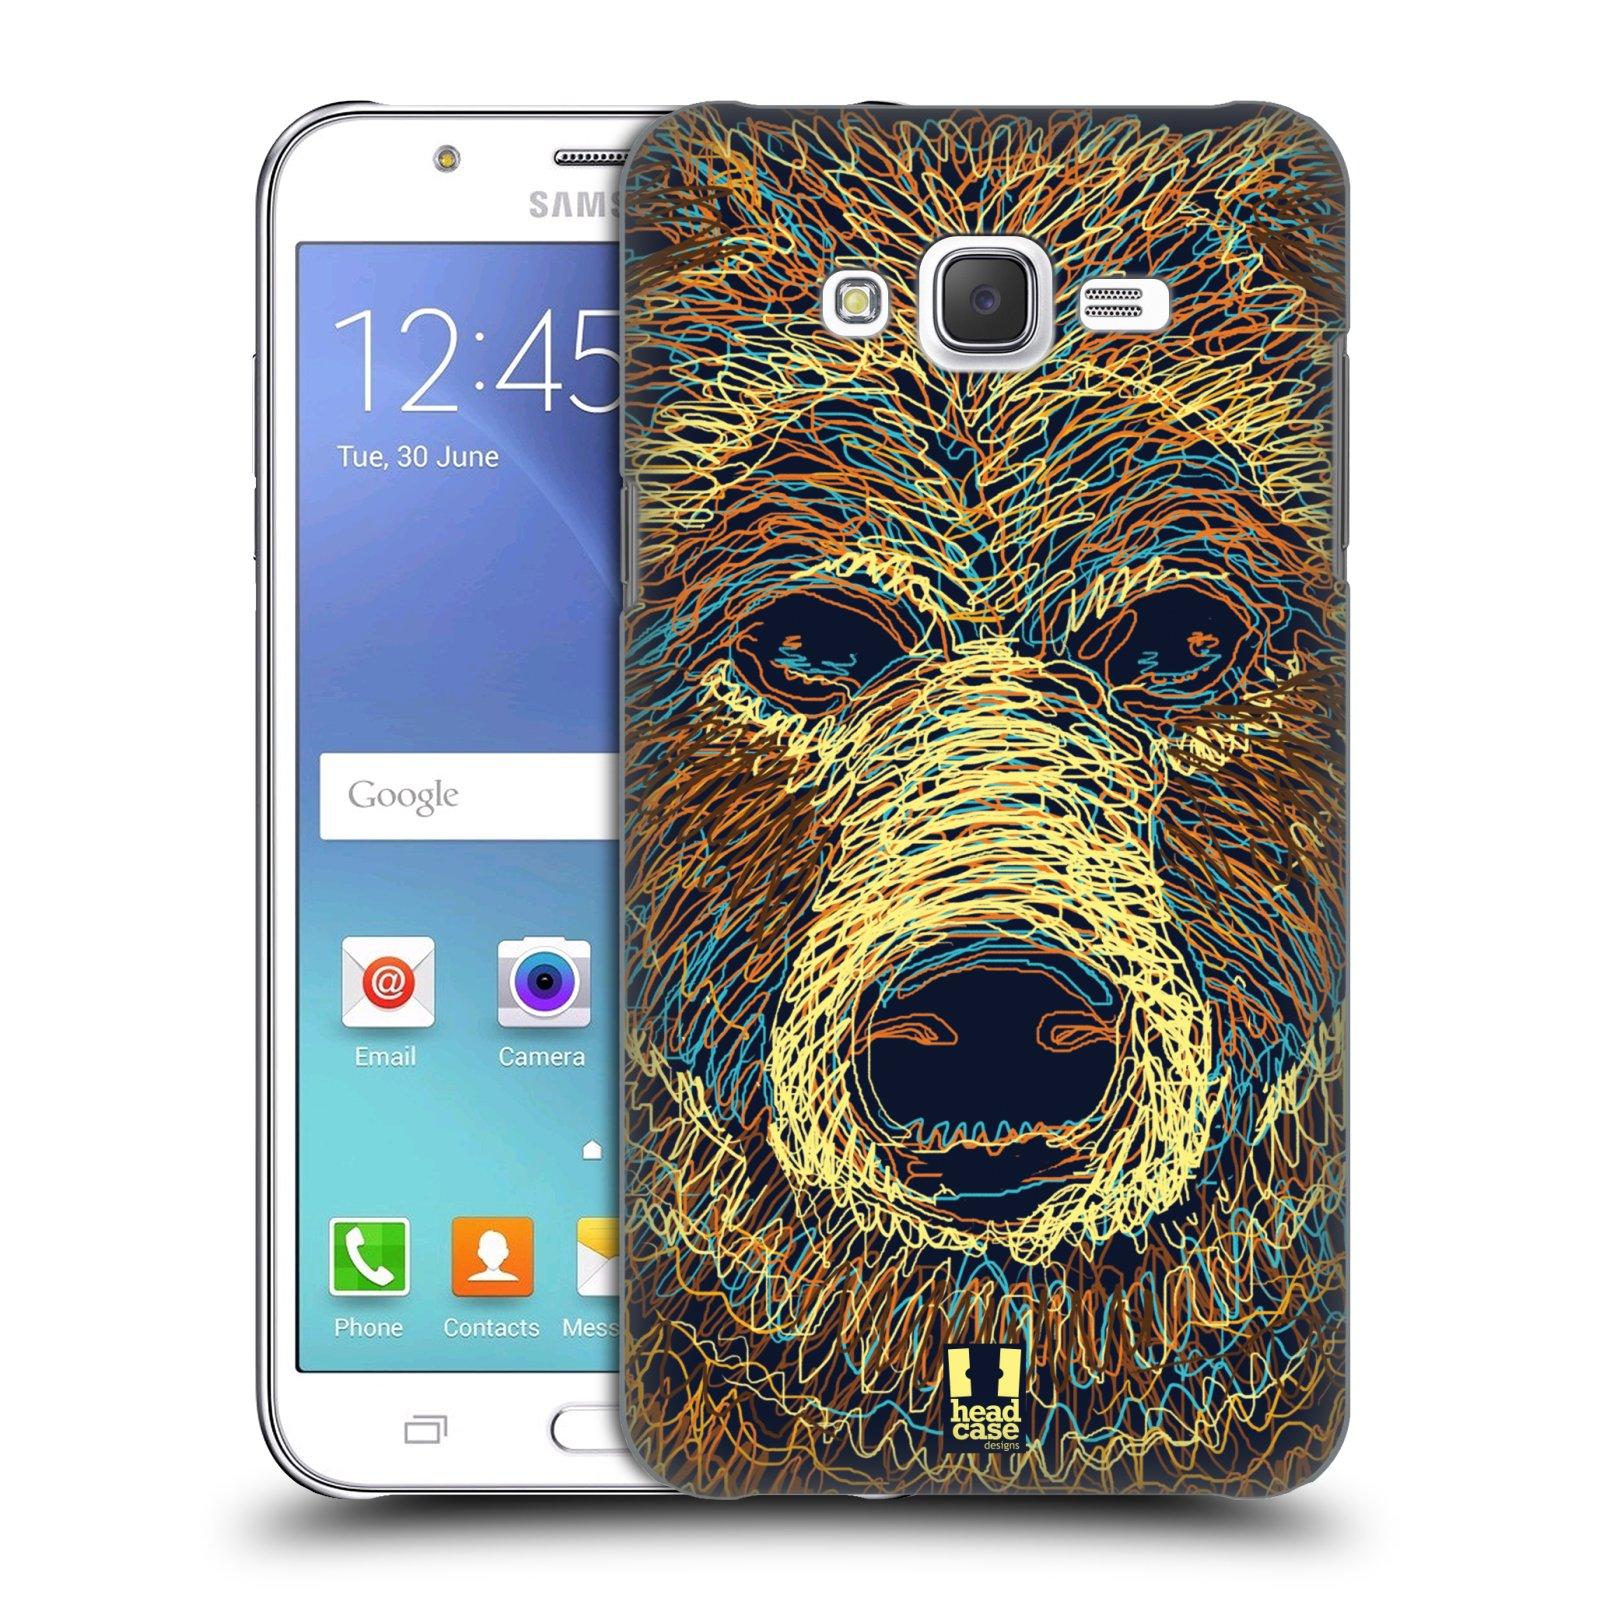 HEAD CASE plastový obal na mobil SAMSUNG Galaxy J7, J700 vzor zvíře čmáranice medvěd